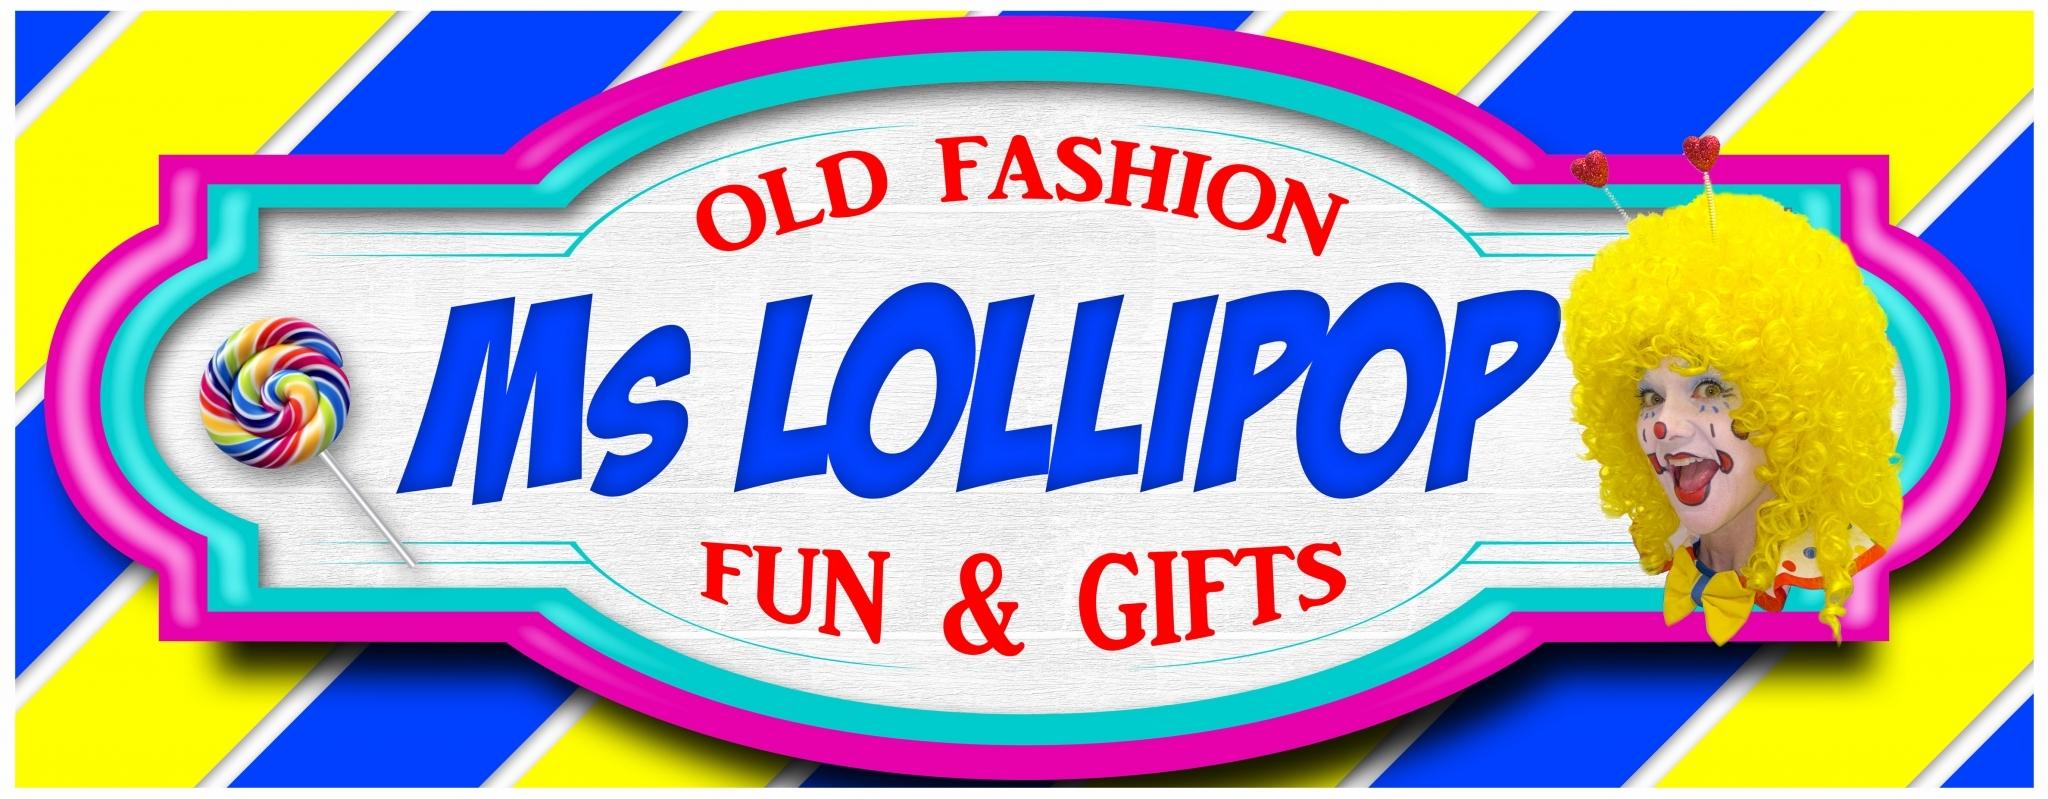 Lollipop SIGN 2019